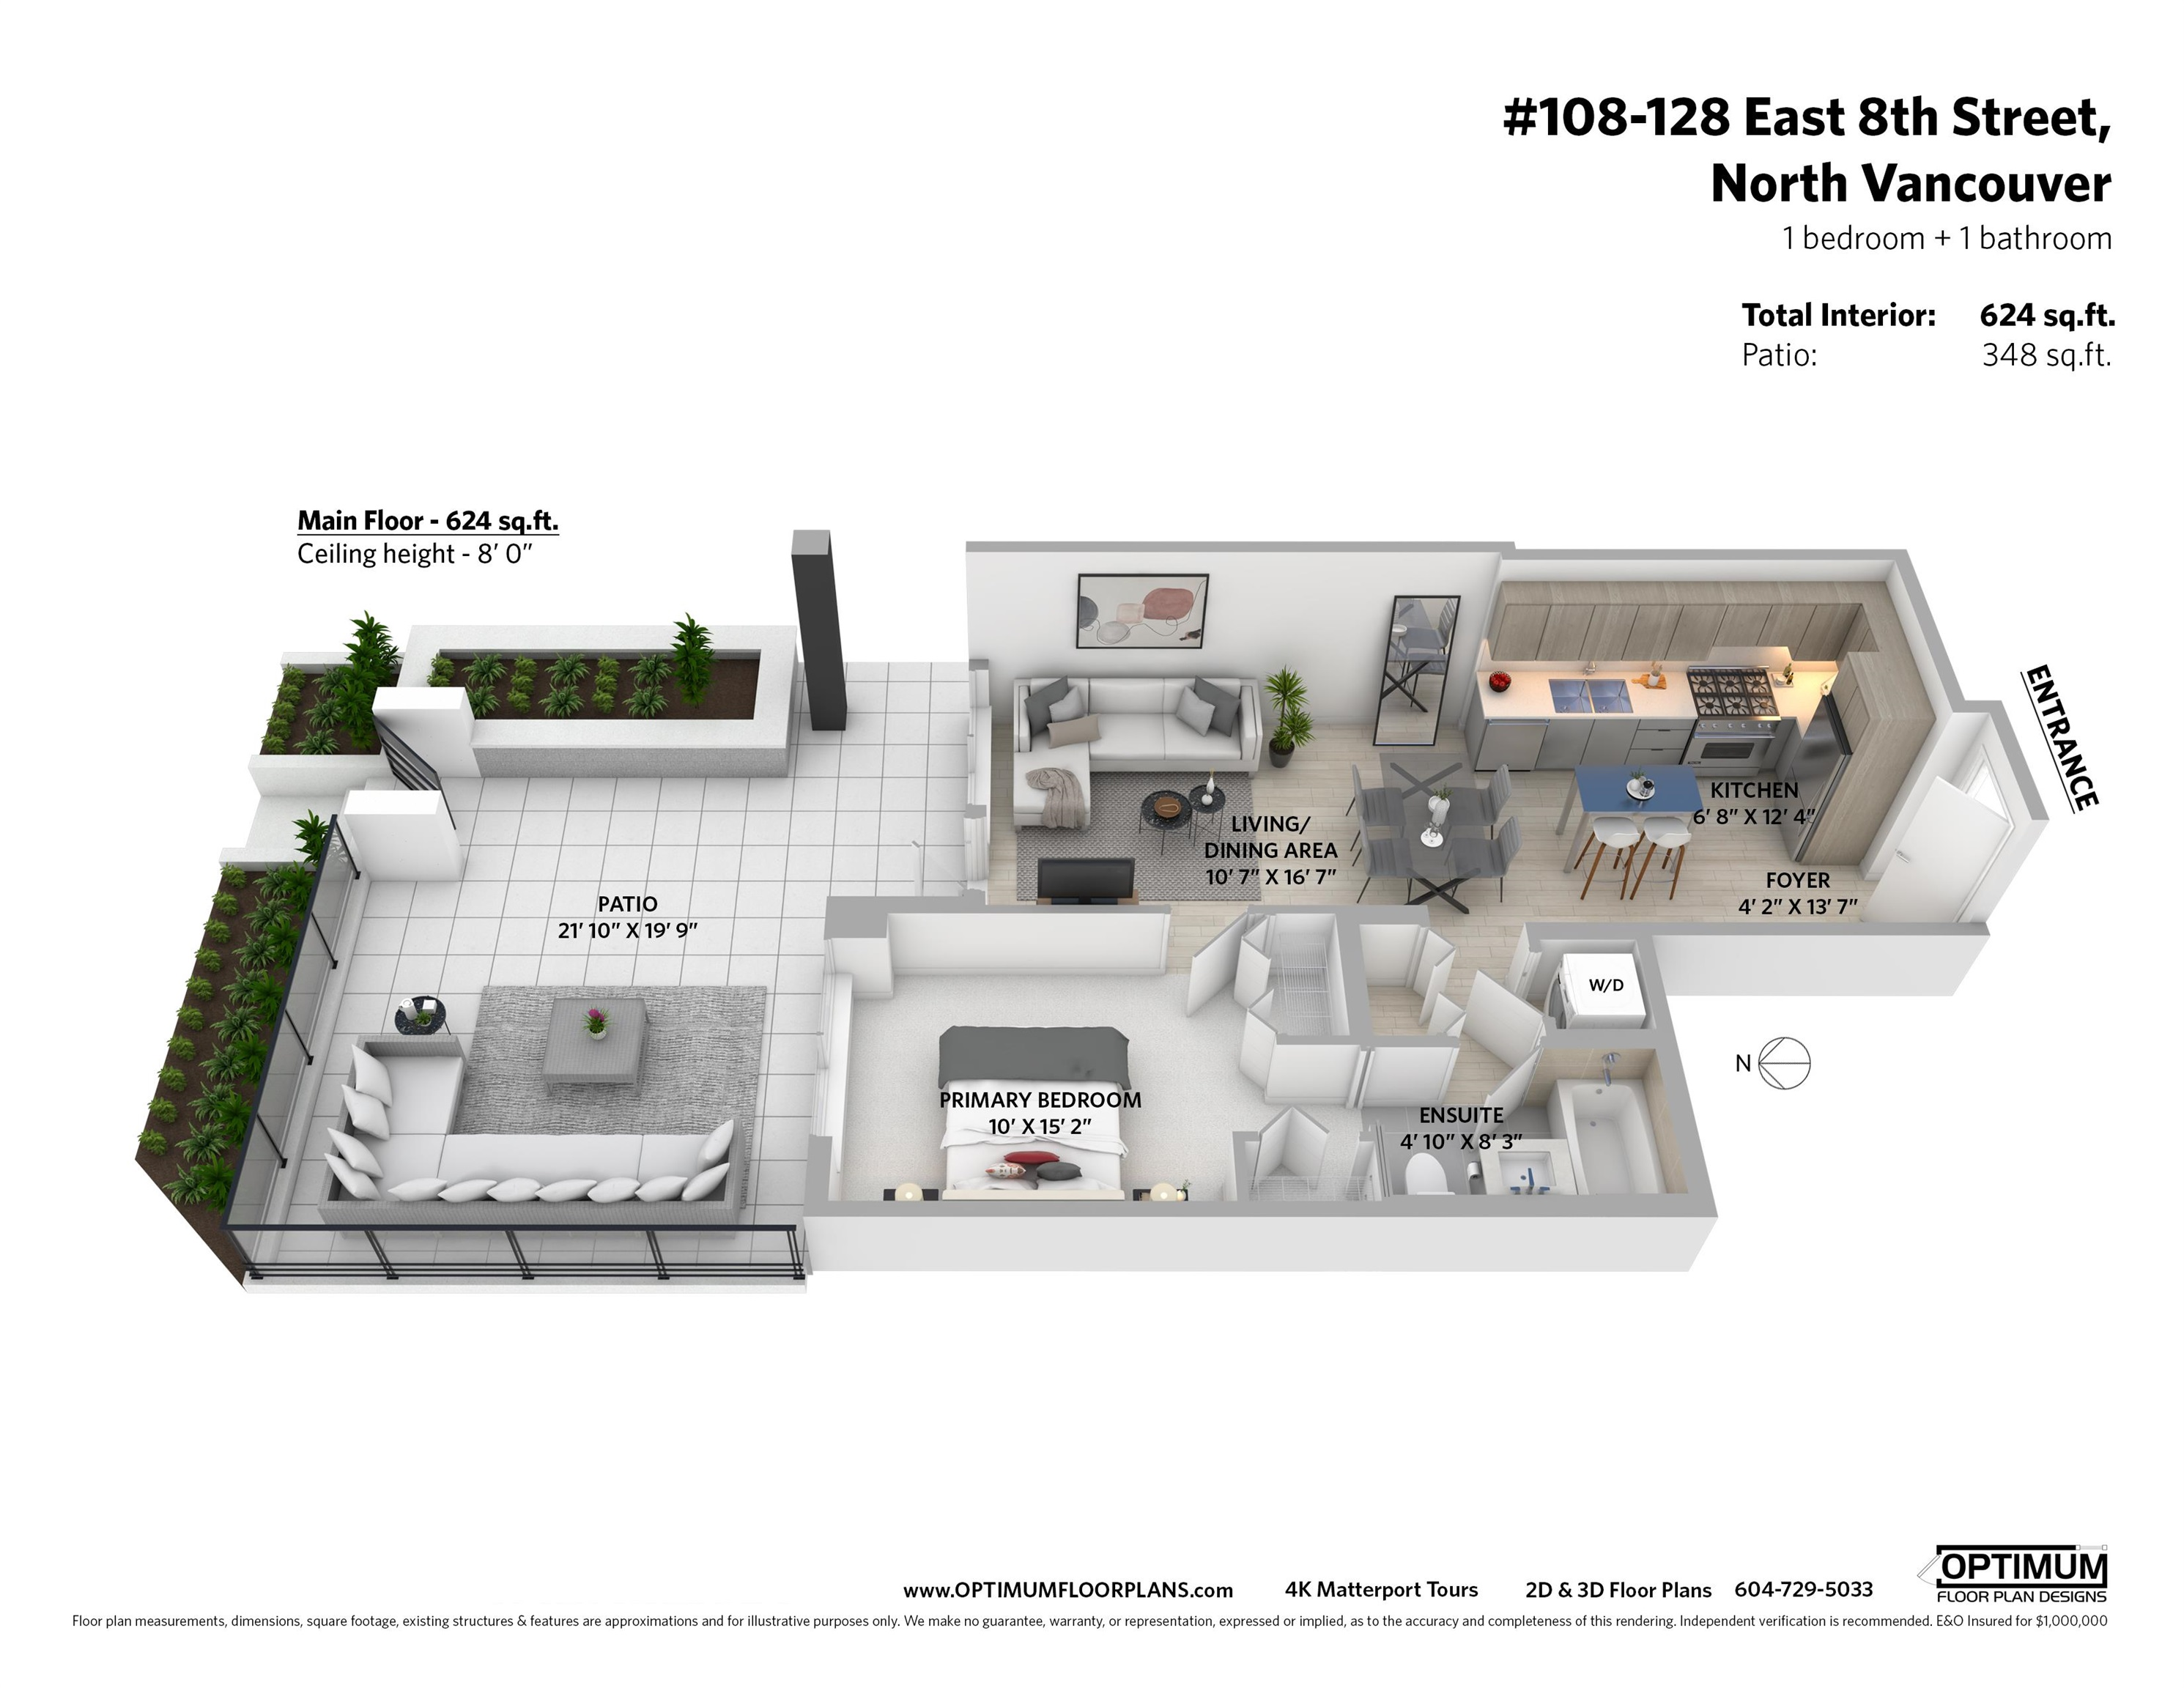 Listing image of 108 128 E 8TH STREET